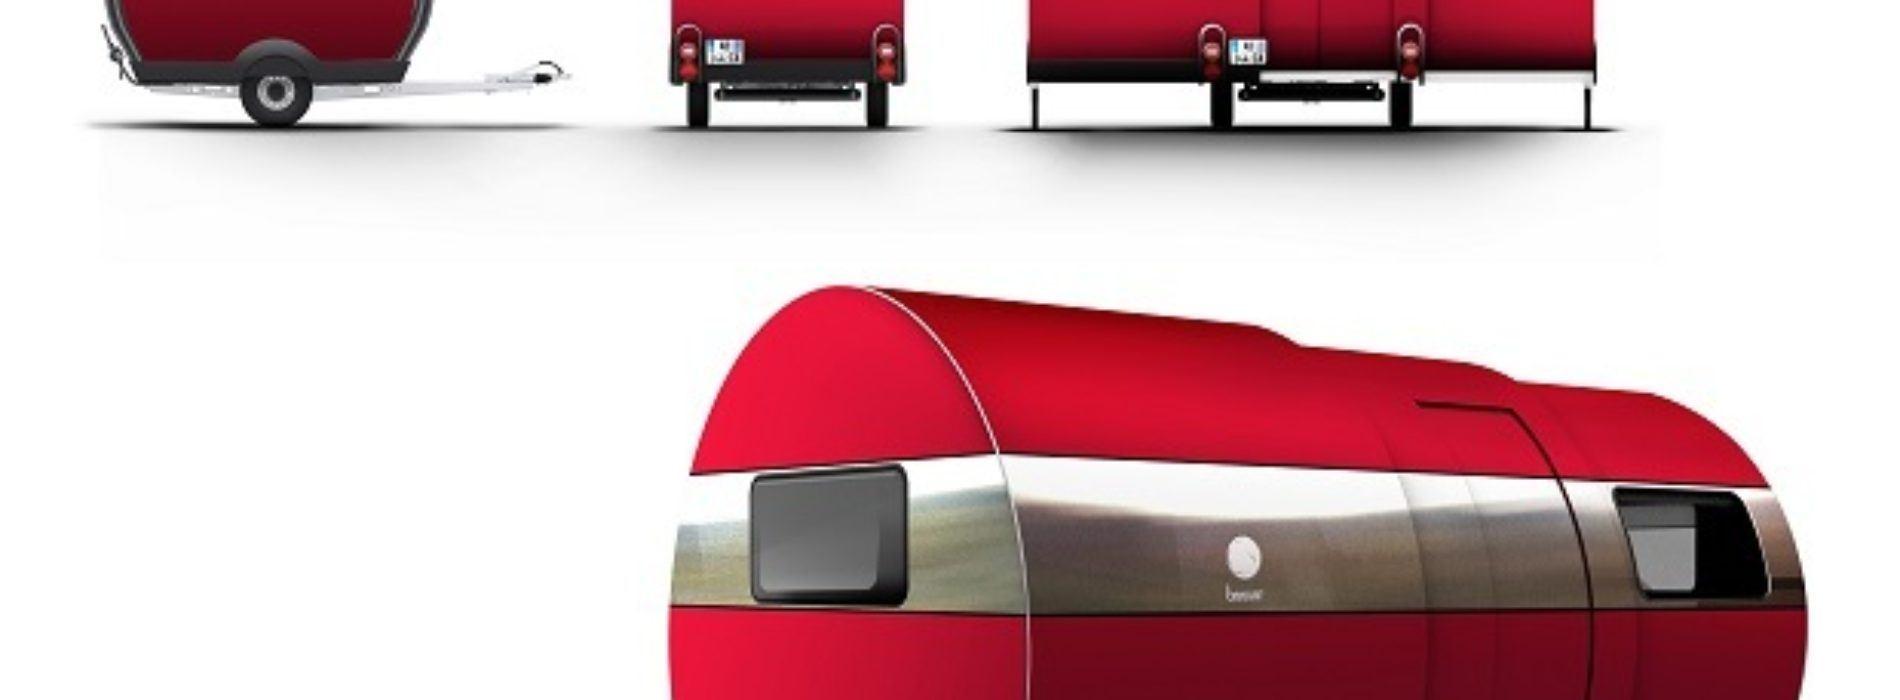 BeauEr 3X, la caravana que crece